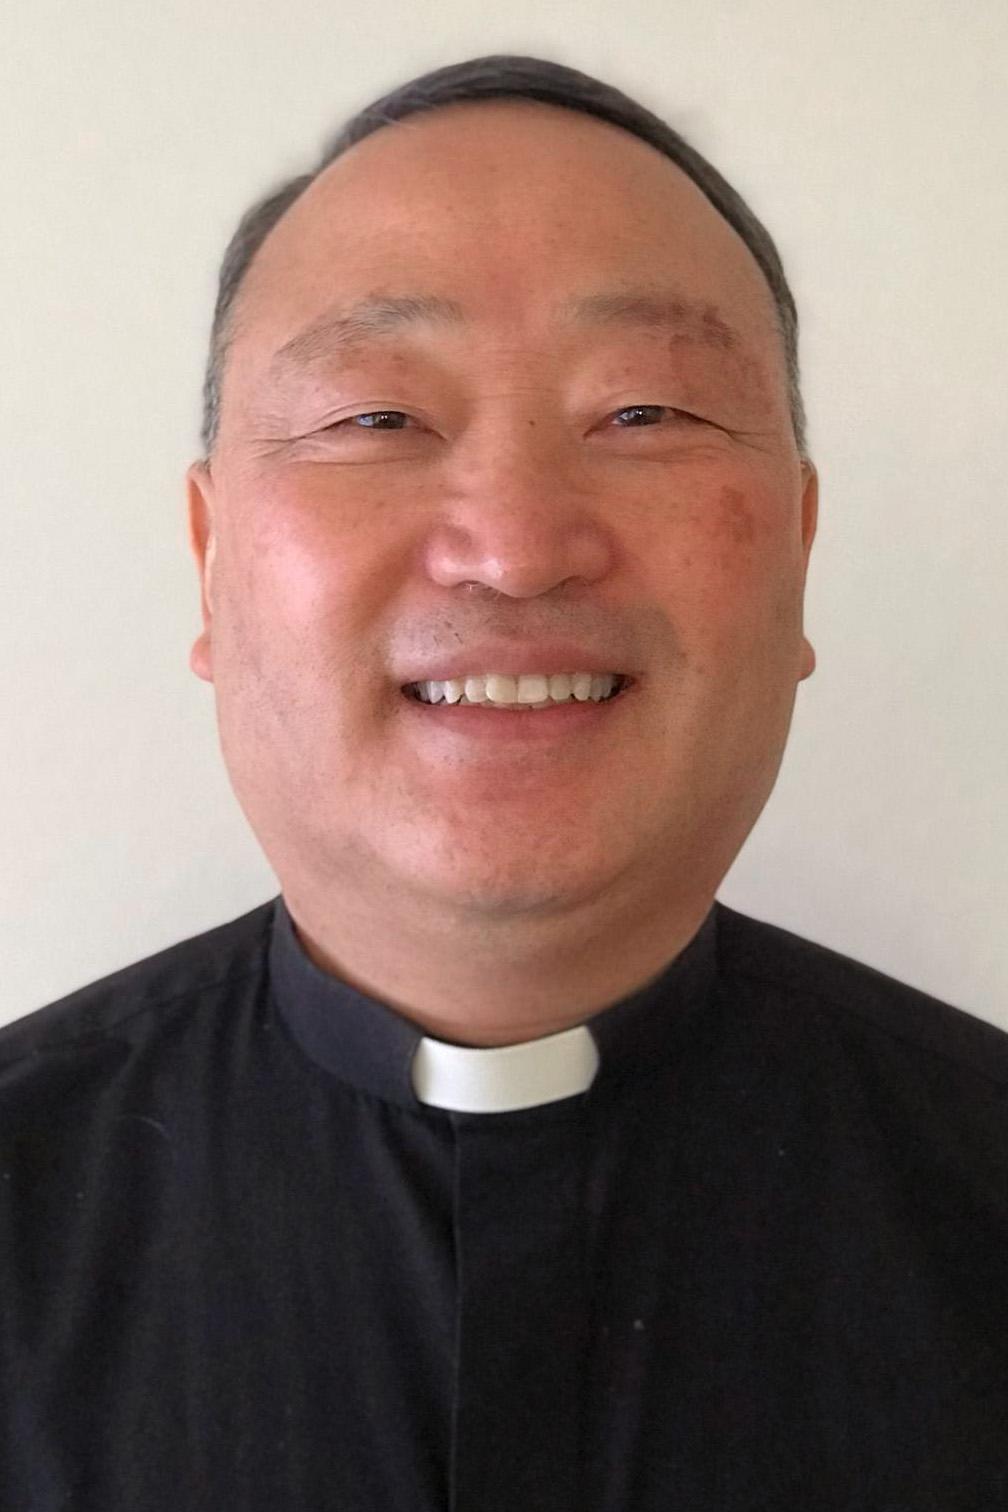 The Rev. Sungho Lee.  Photo courtesy of the Rev. Sungho Lee.